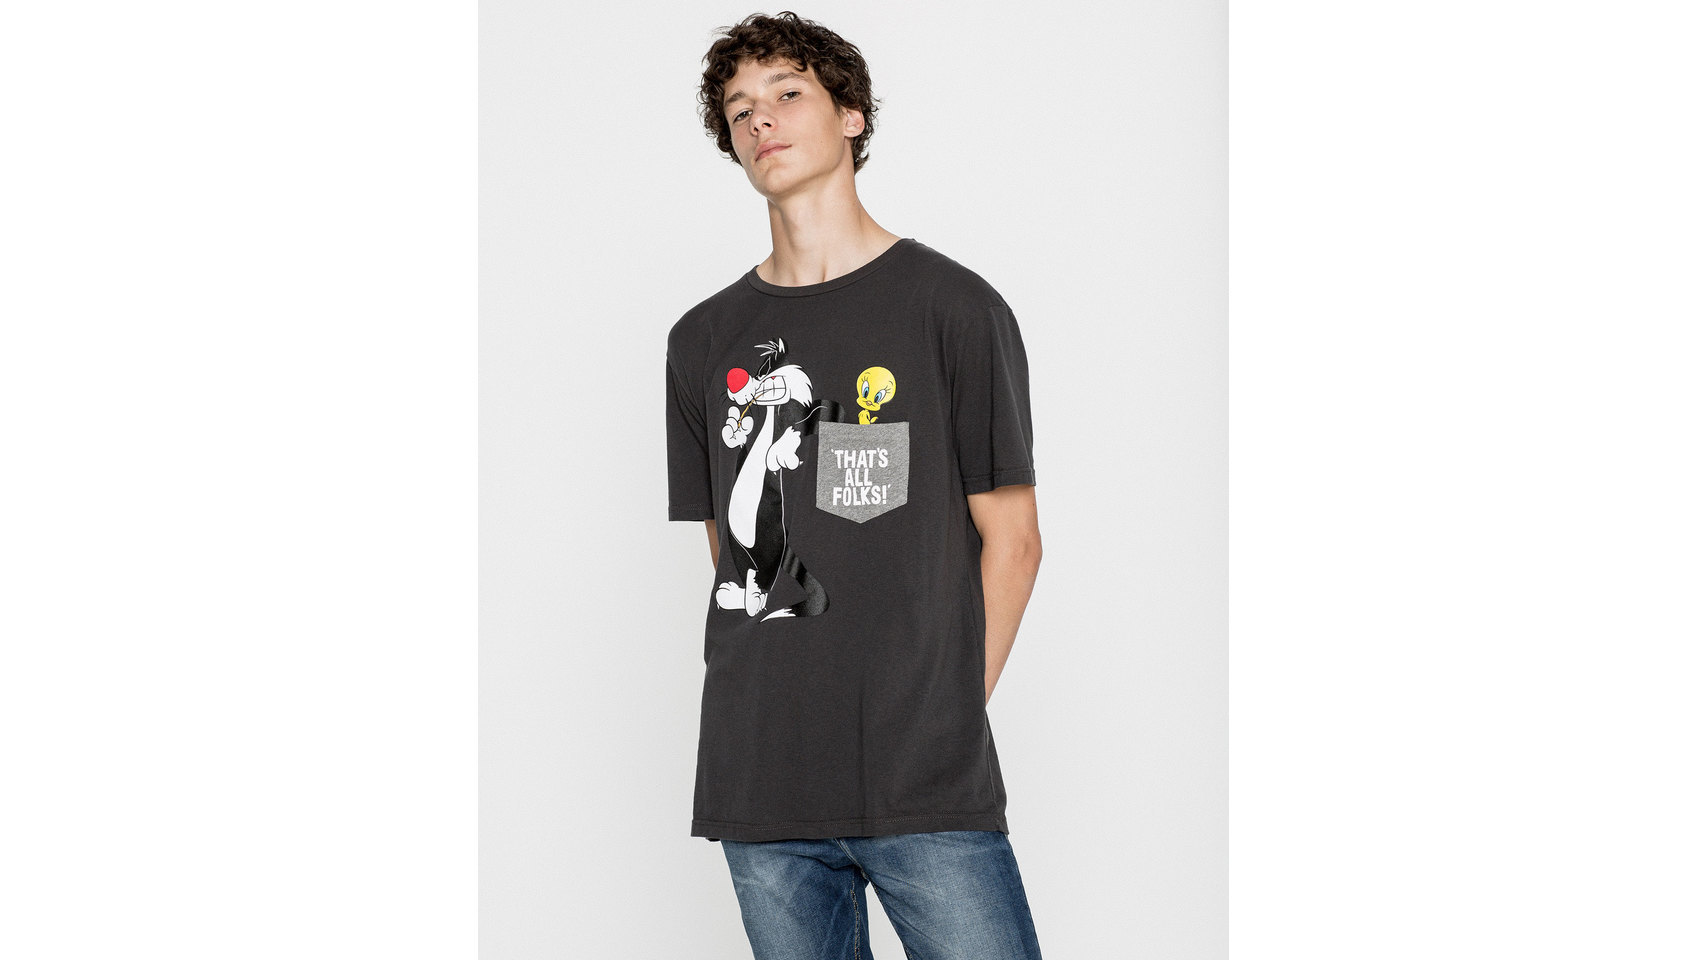 Camiseta con dibujo de Looney Tunes de Pull and Bear.